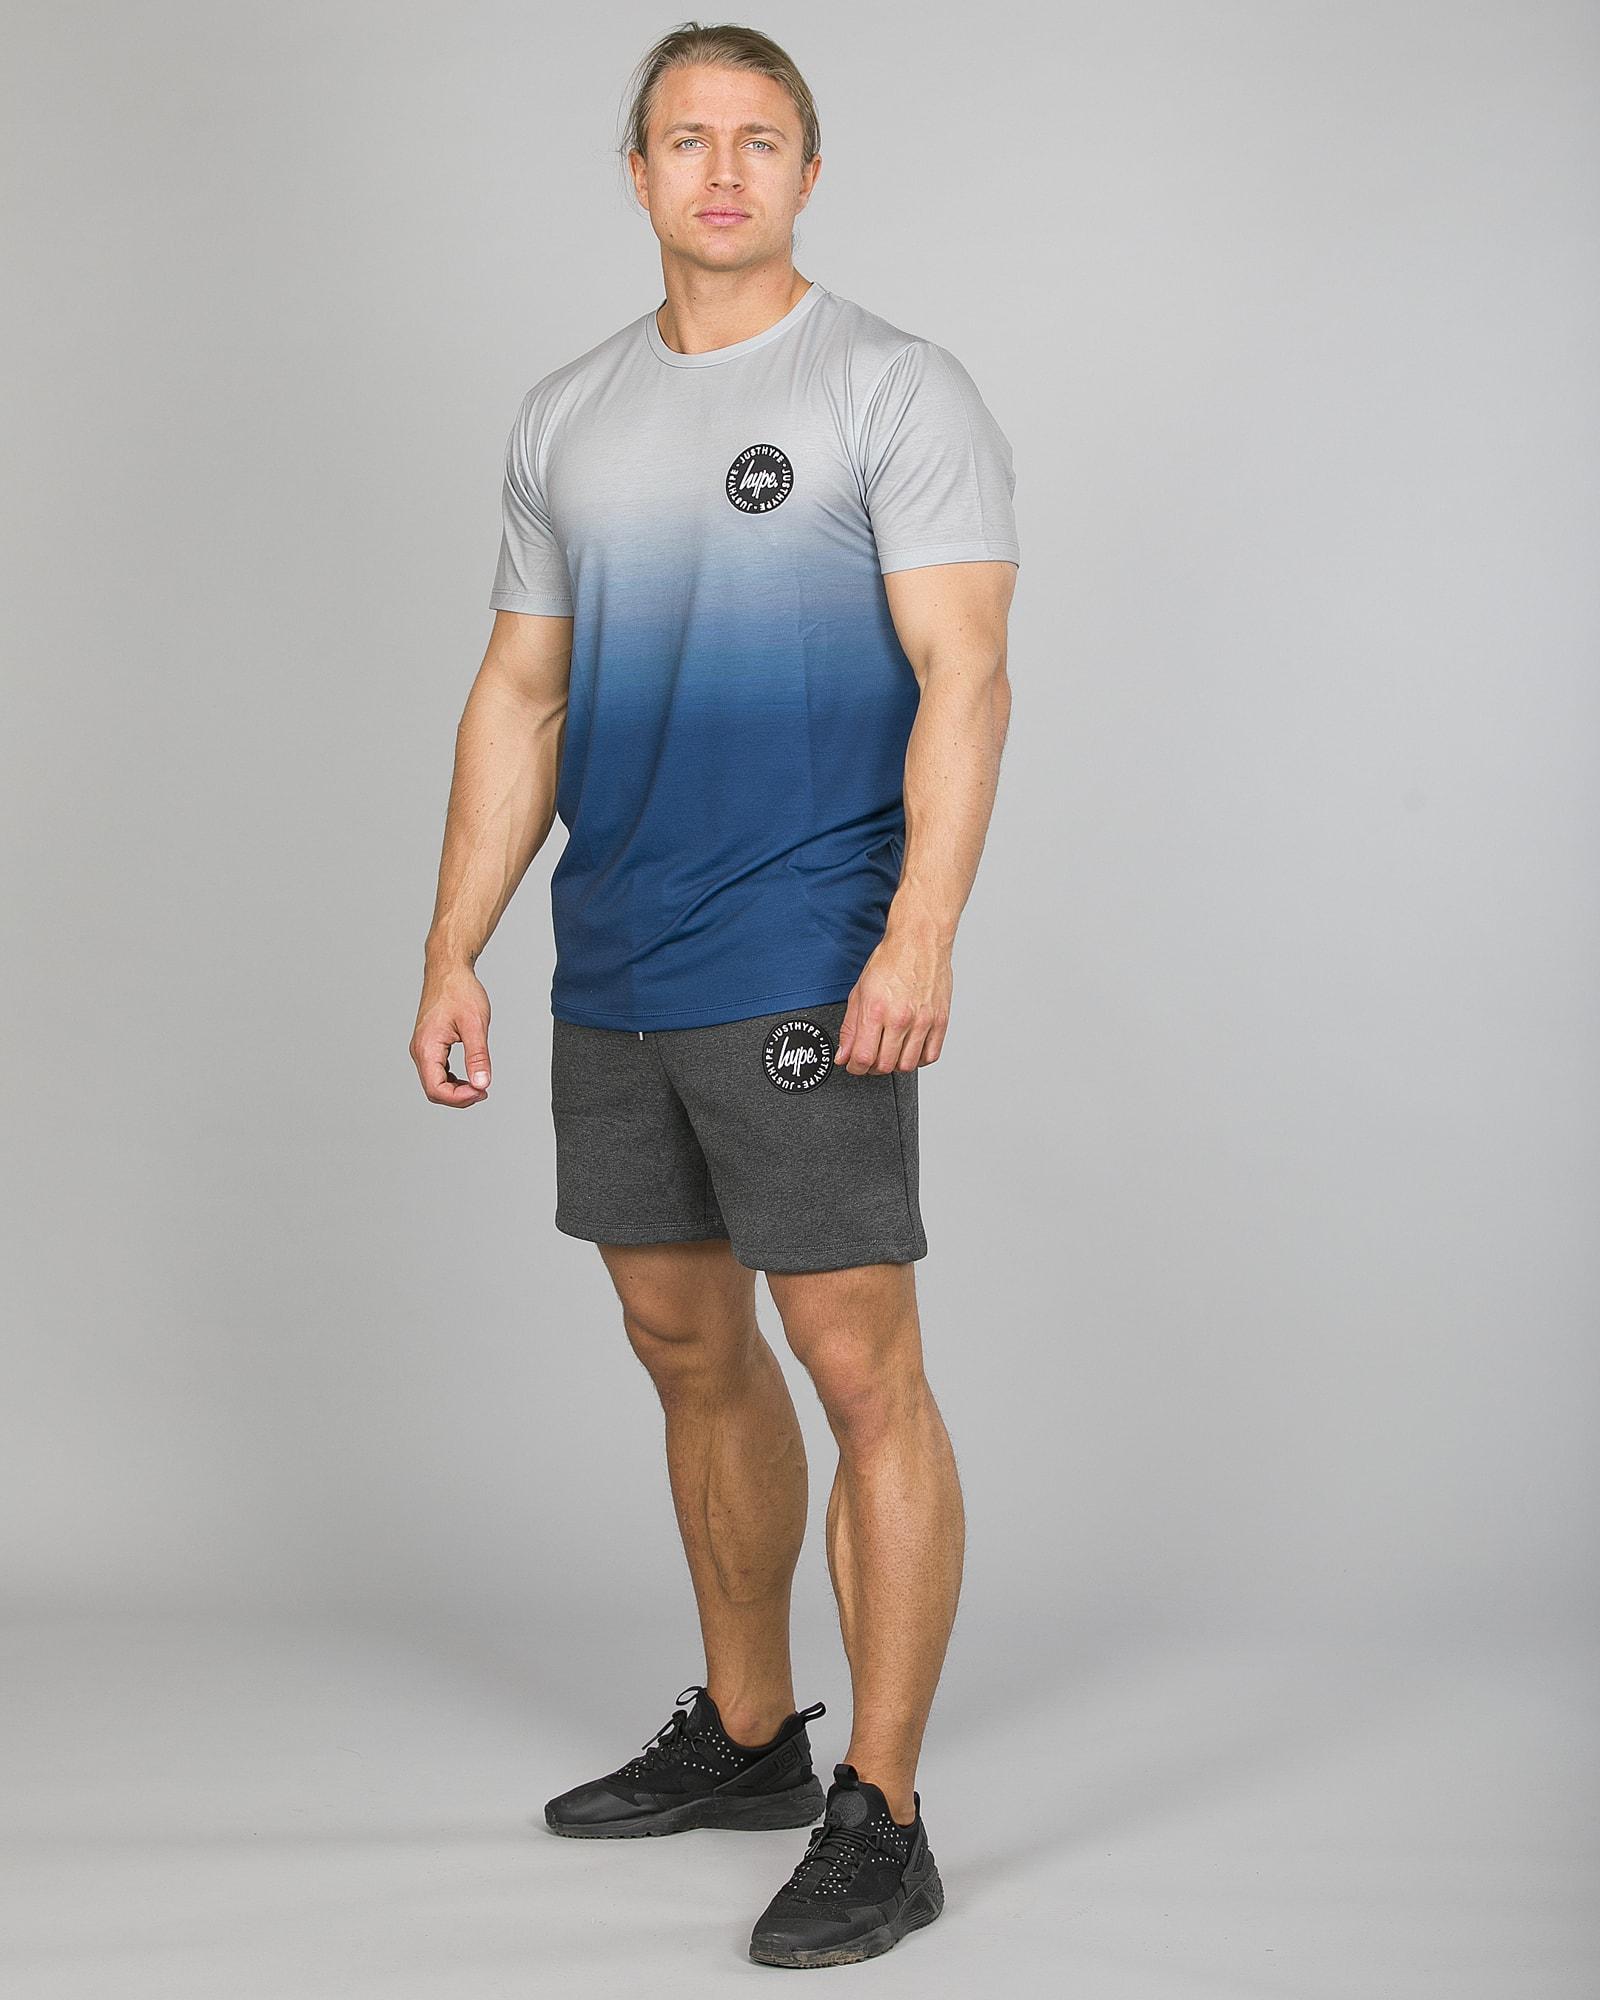 Hype Midnight Fade T-Shirt Men ss18210b Blue:Grey and Badge Shorts Men tm2ndrp16 Charcoal b